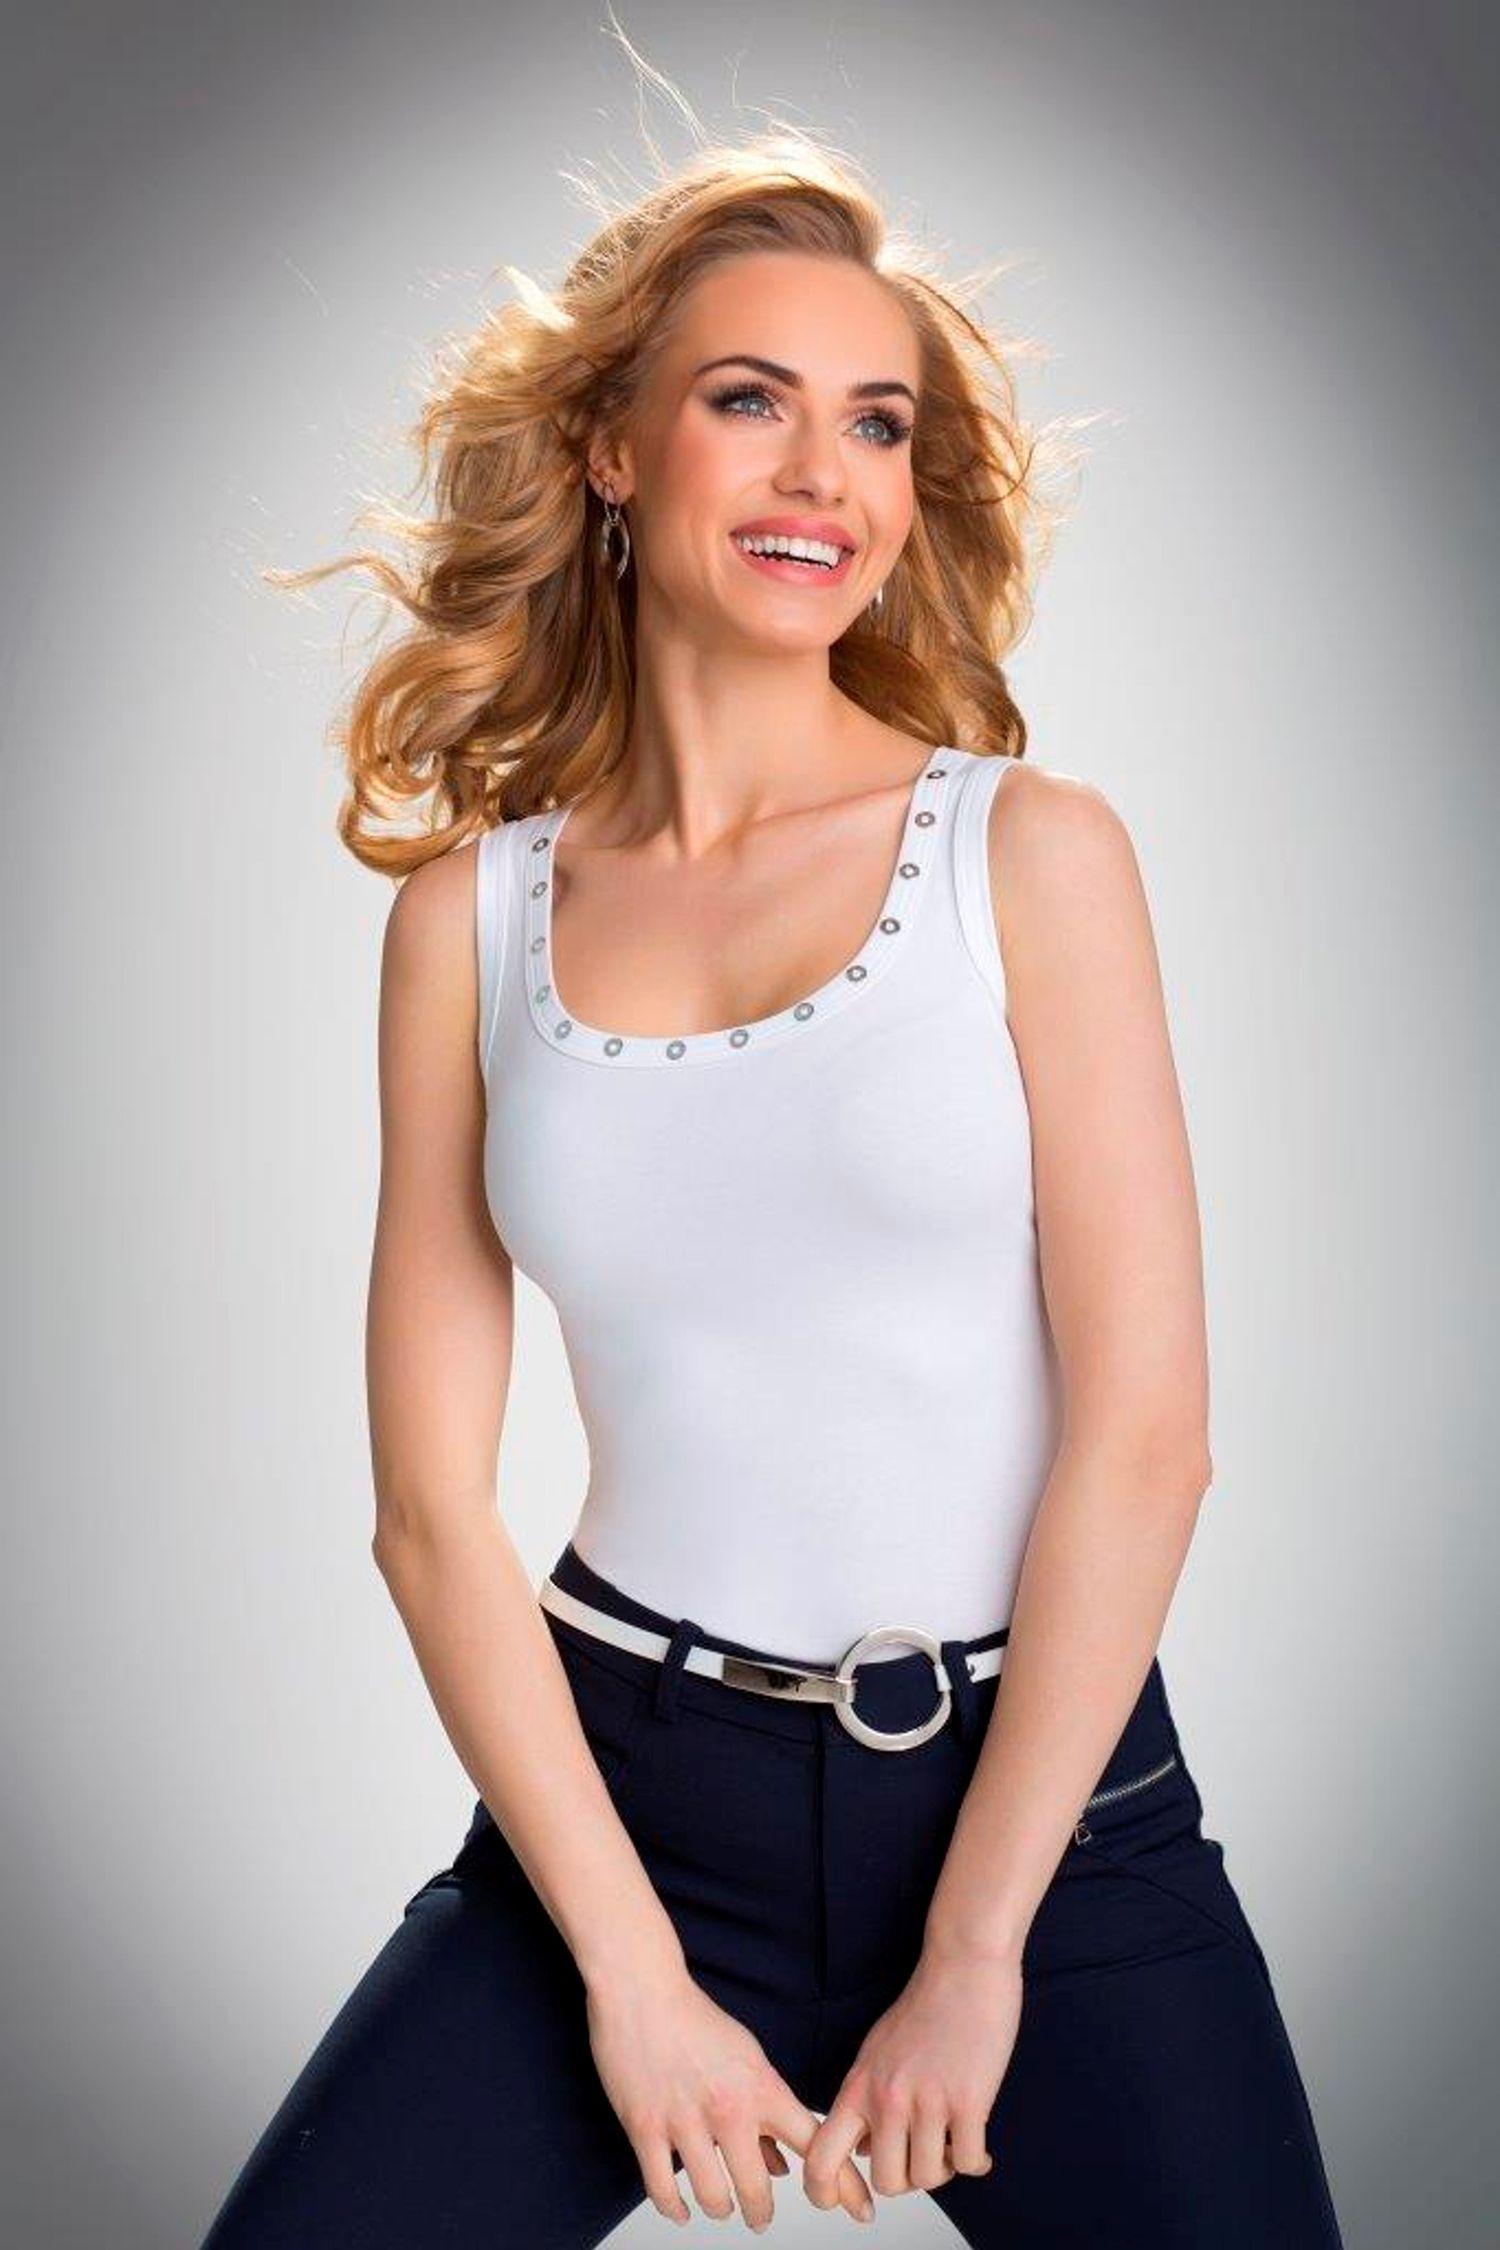 Eldar Koszulka Damska Kasandra Bialy r. M 5901490148805 Blūzes sievietēm